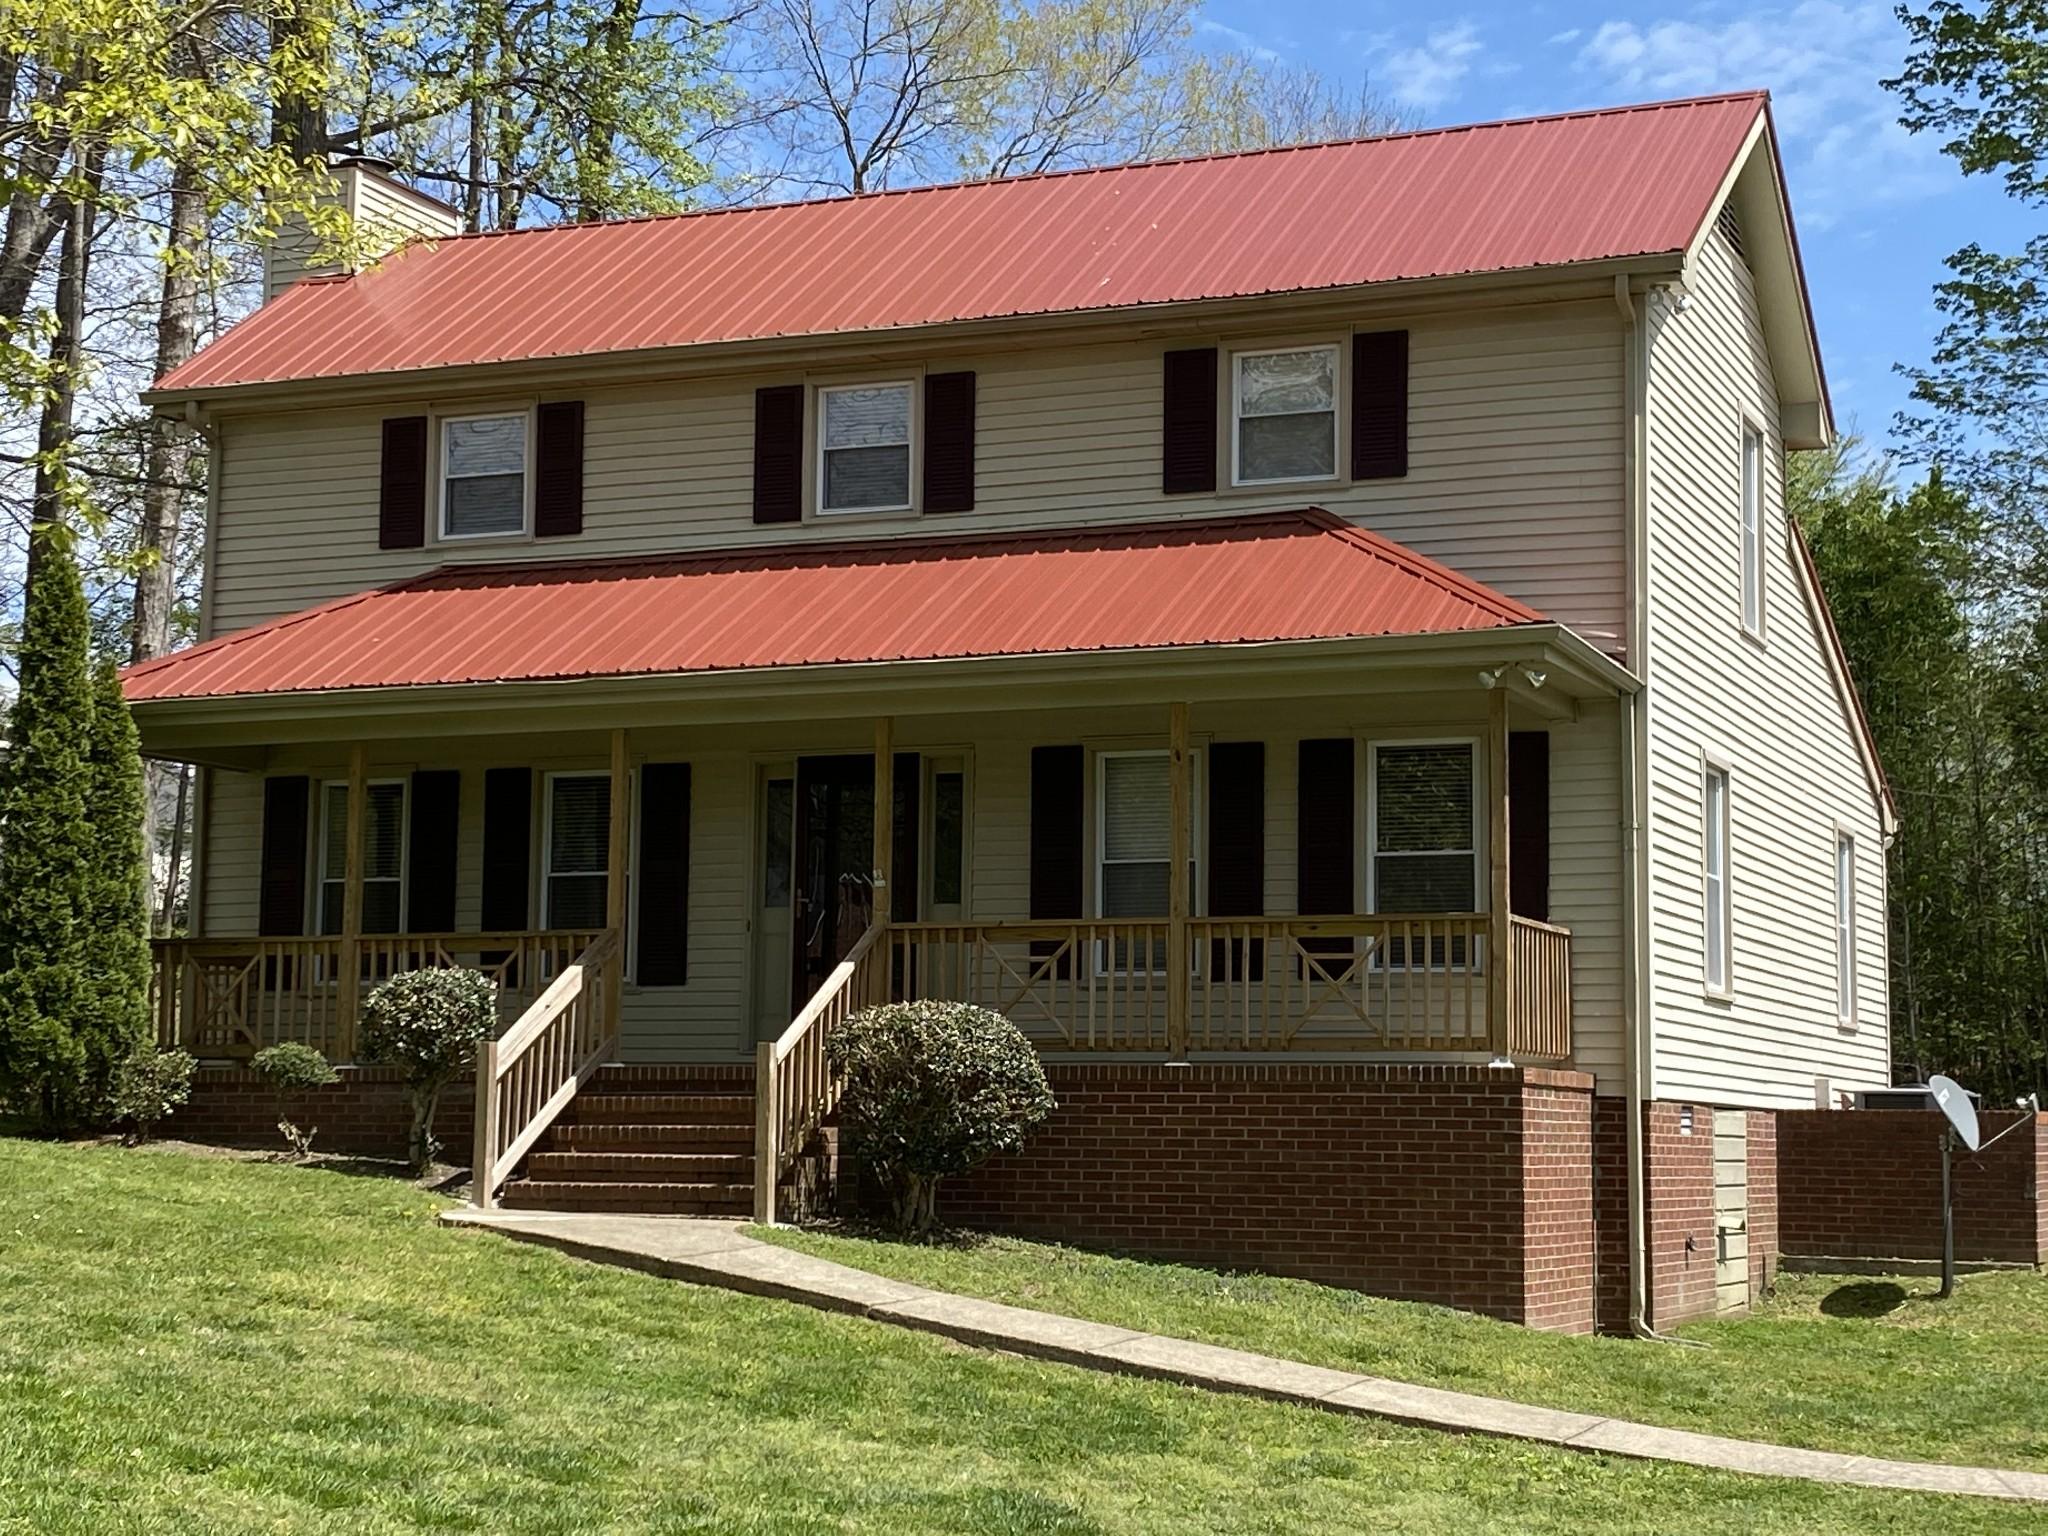 826 Hillside Dr Property Photo - Springfield, TN real estate listing